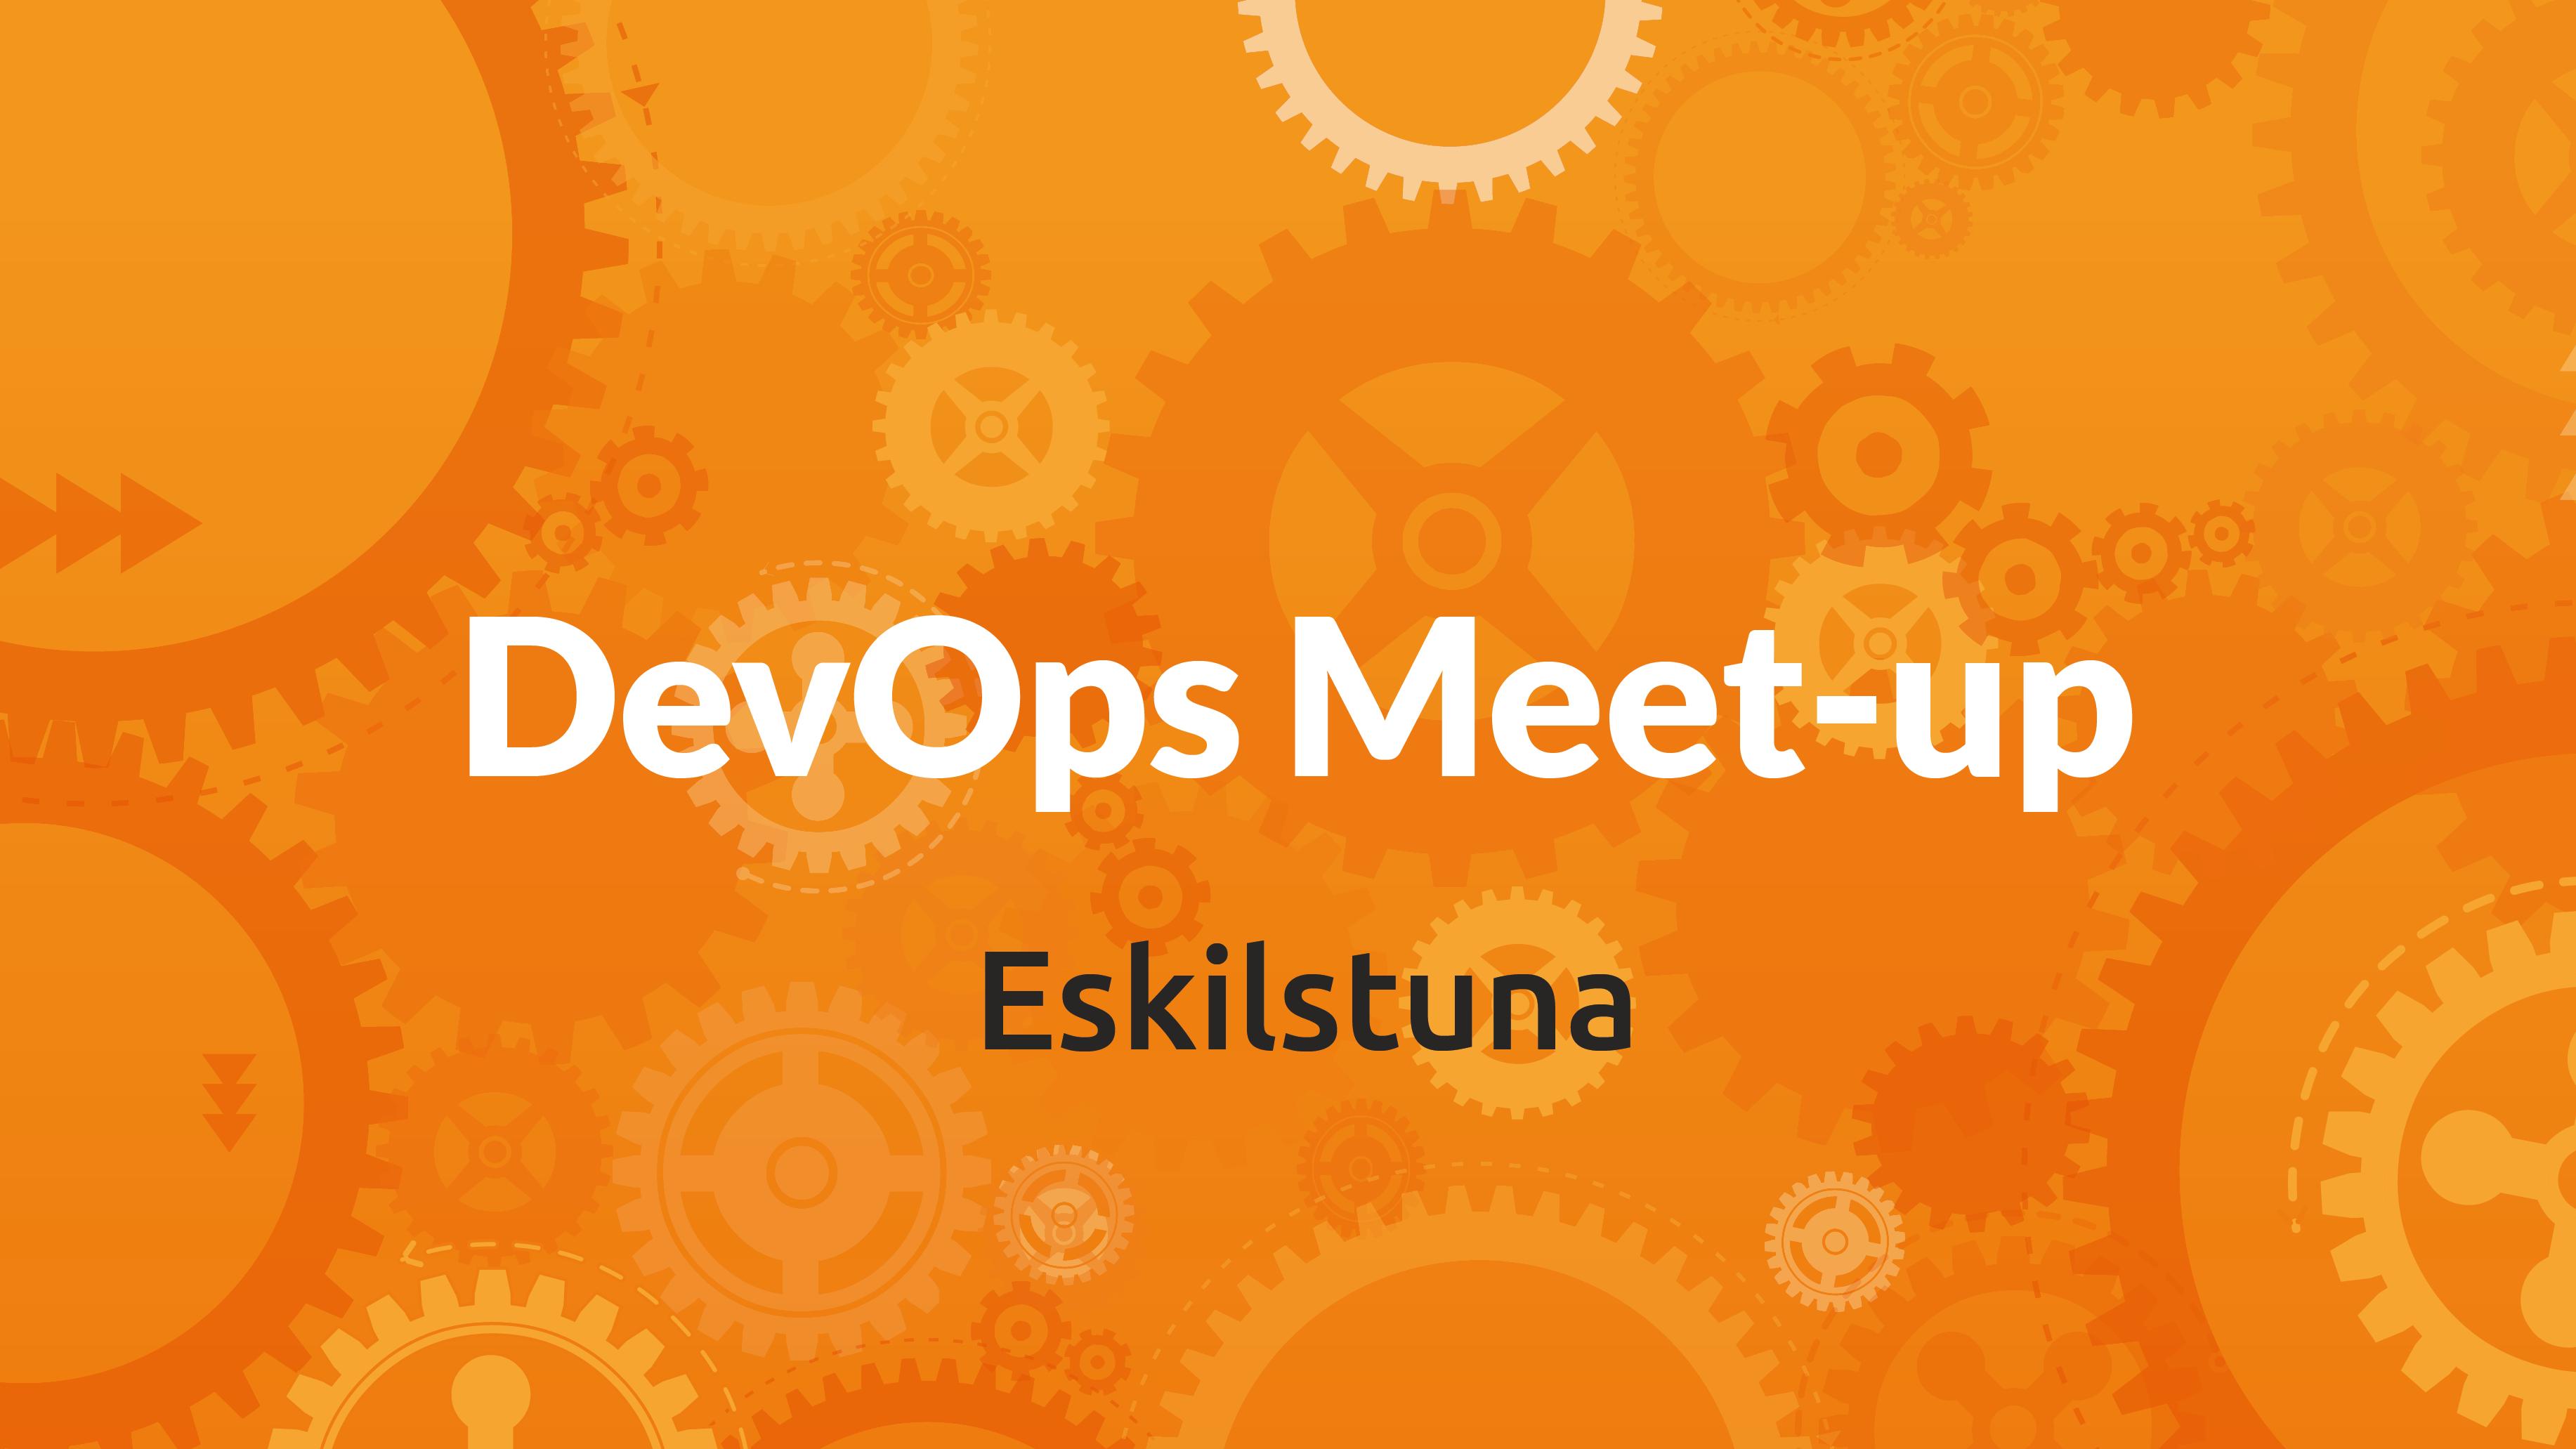 Eskilstuna DevOps Meetup